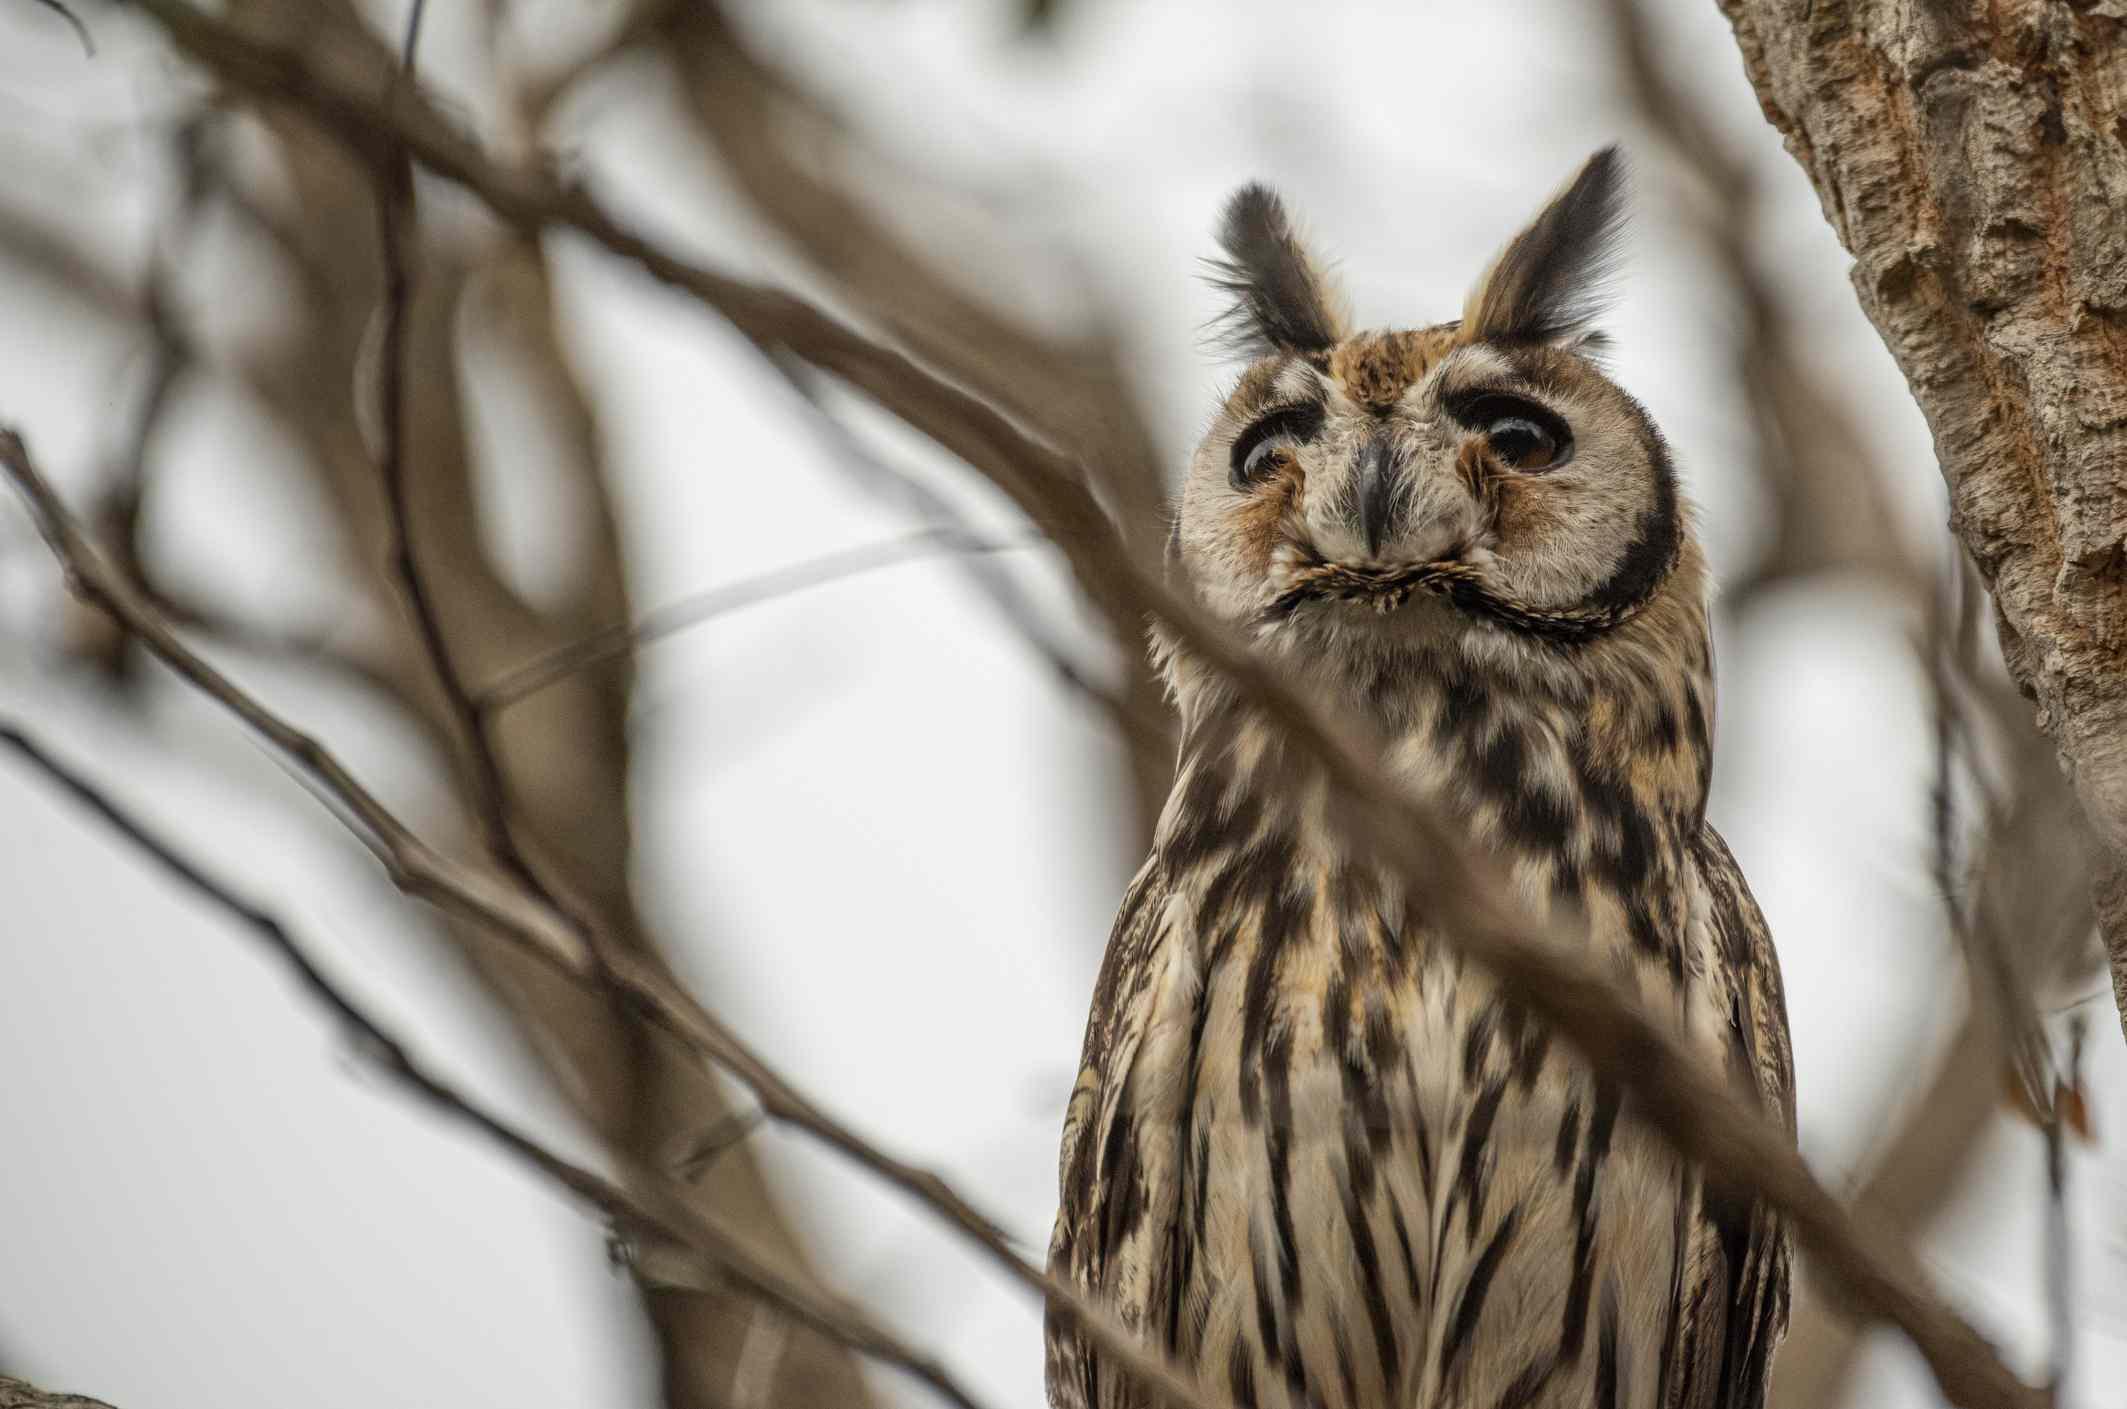 Striped owl in a tree